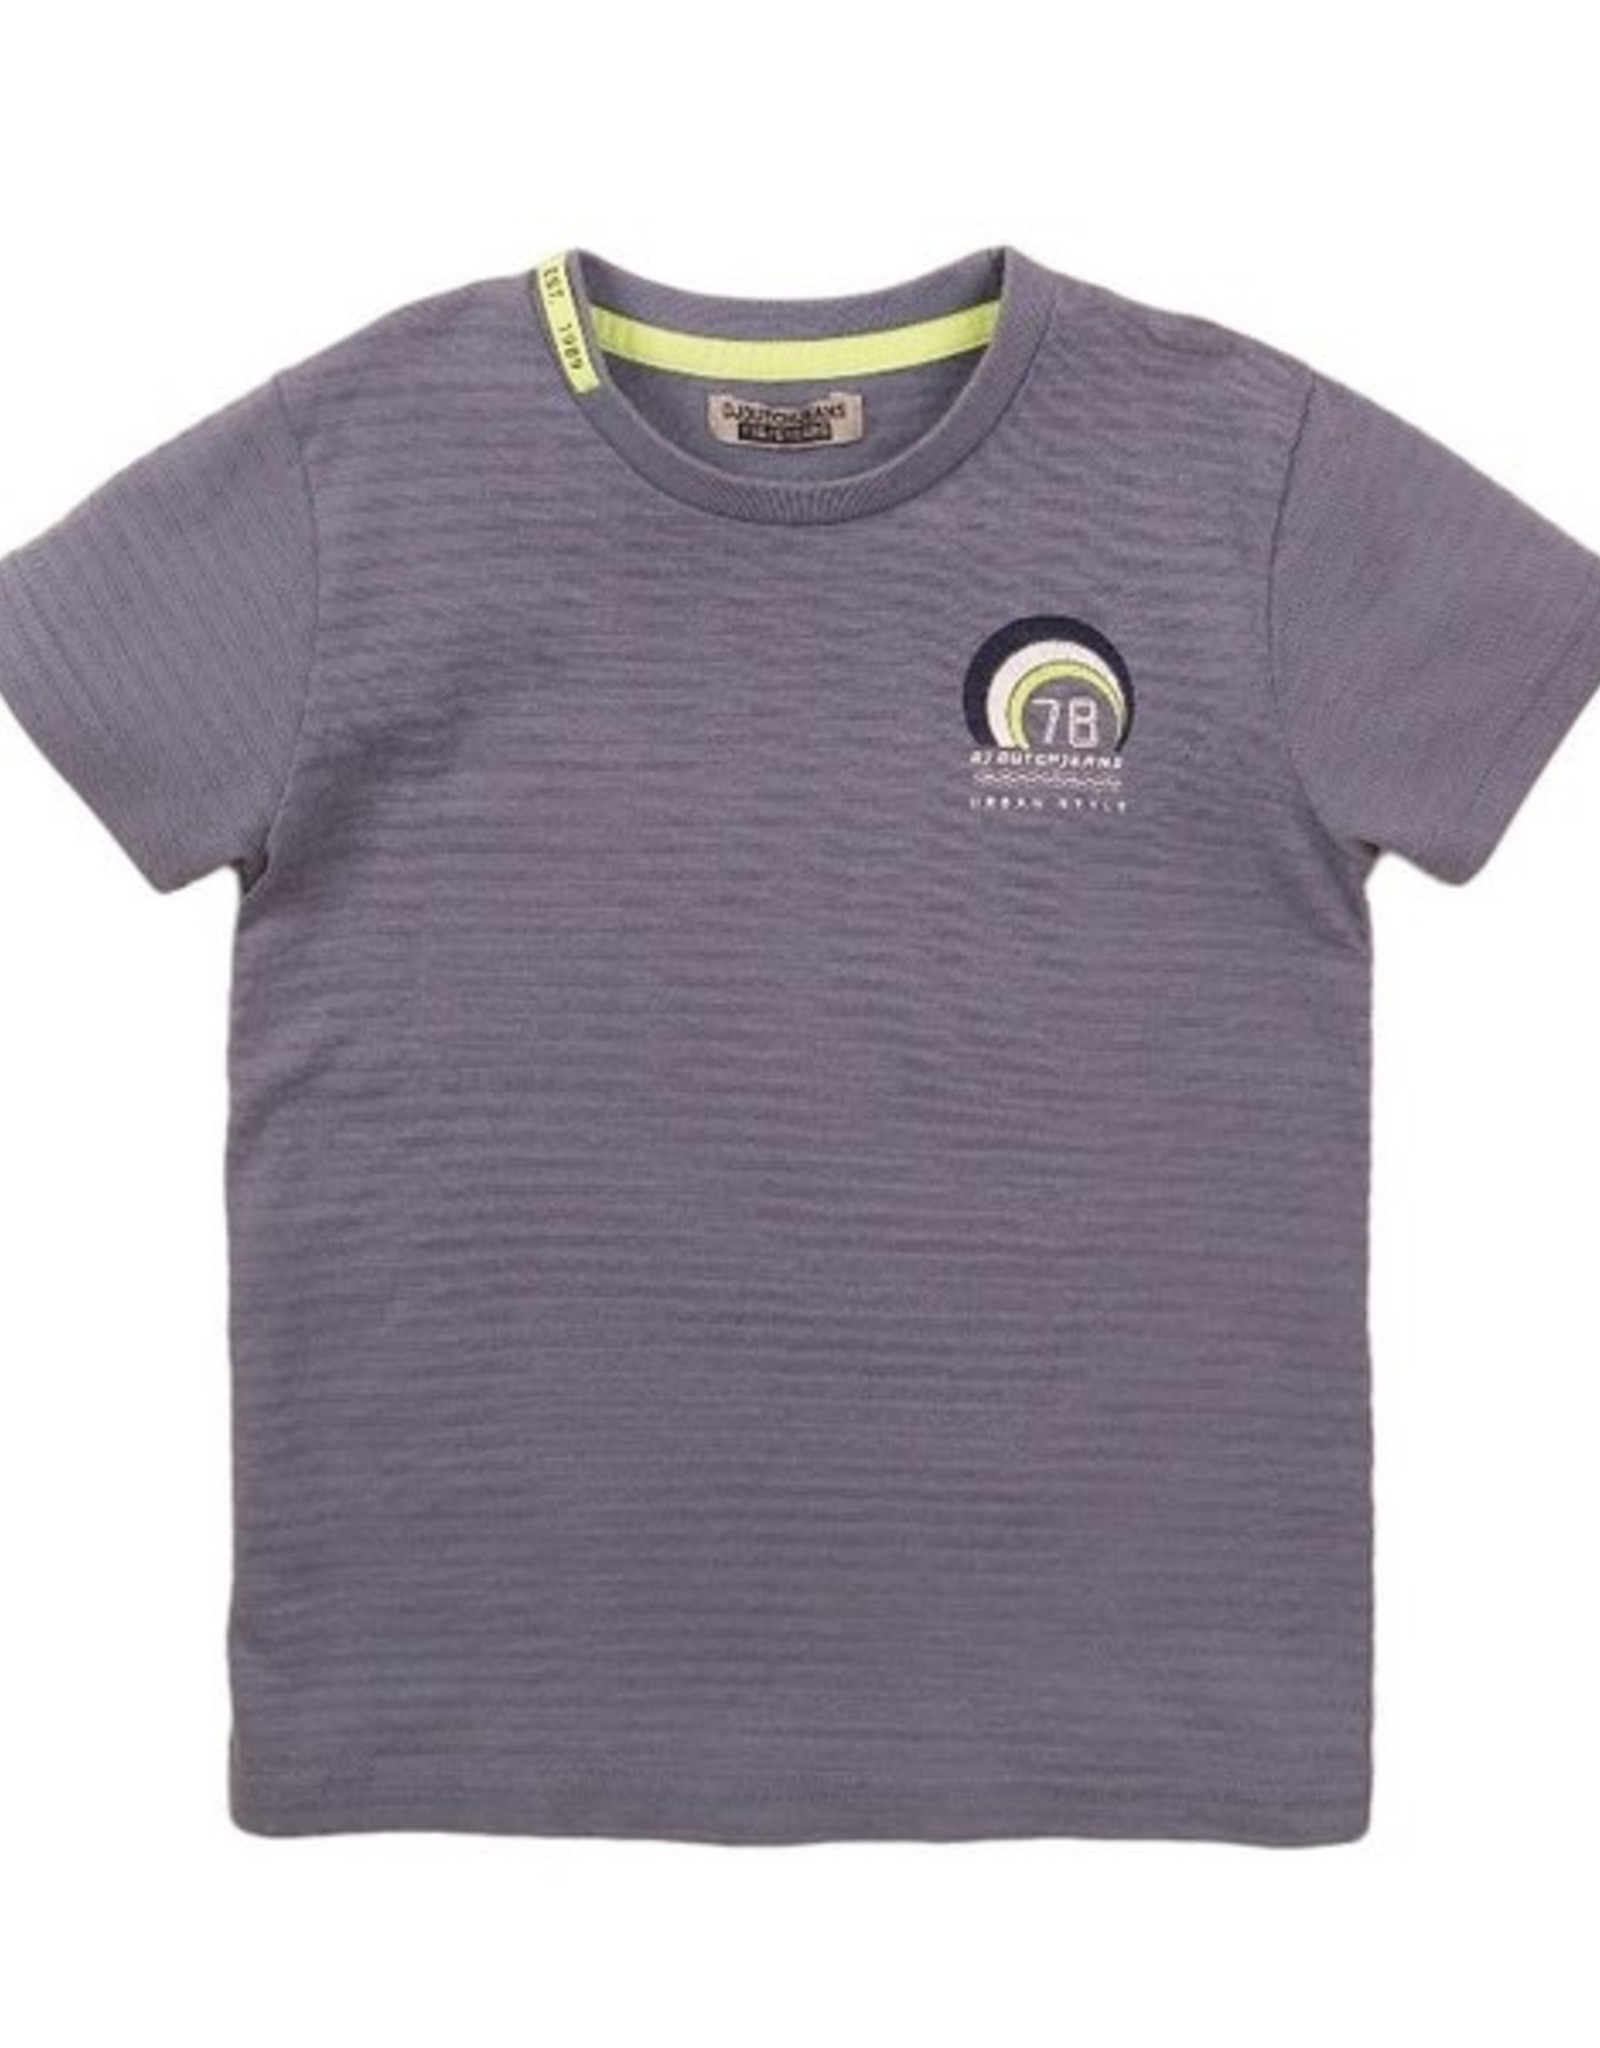 SP21 B Urban Style T-Shirt